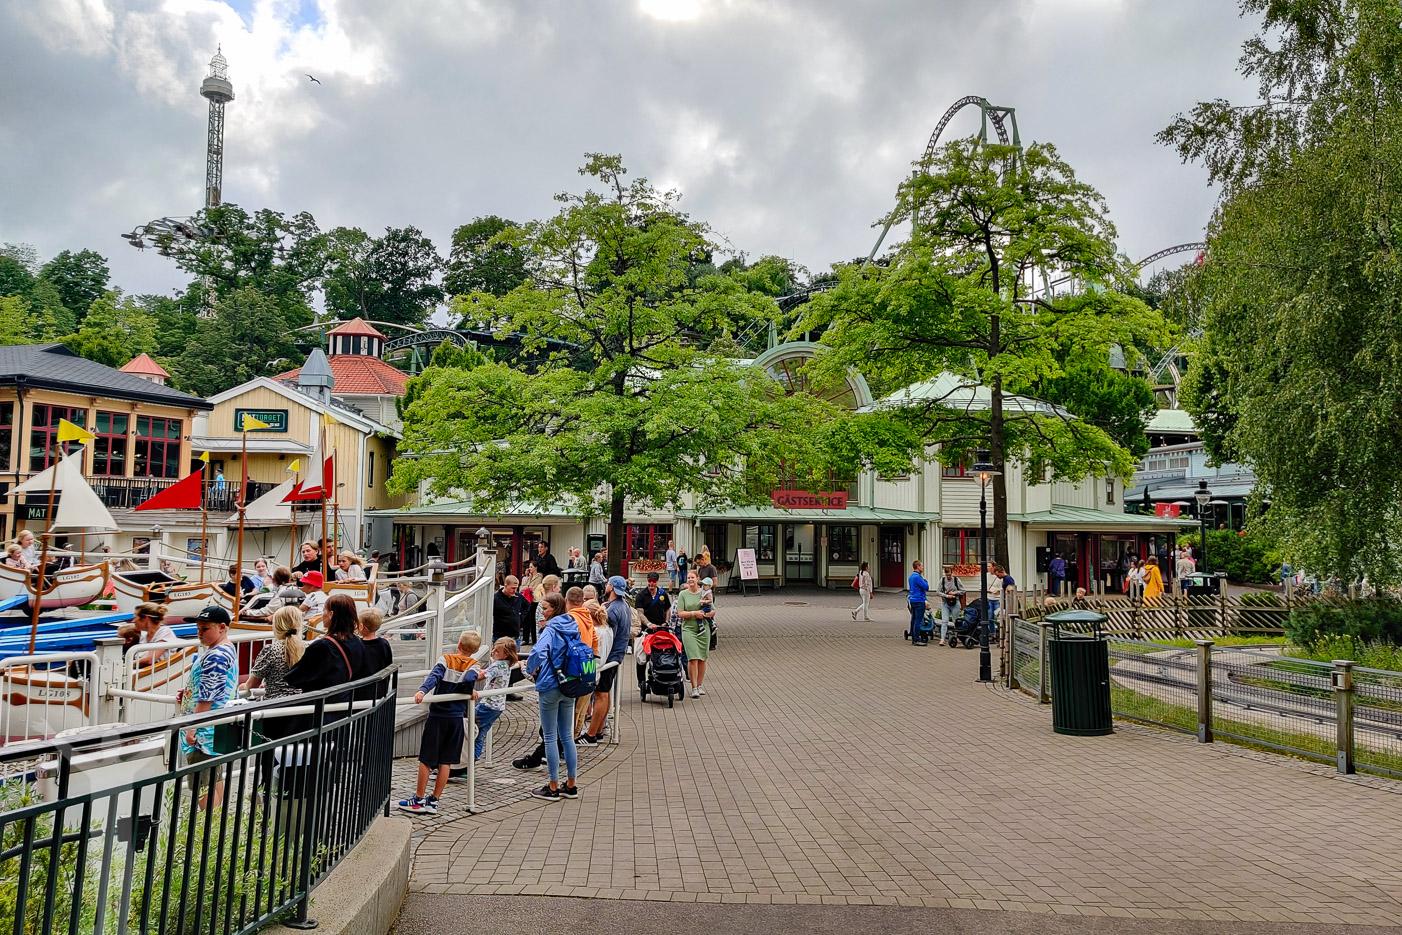 Liseberg - Sveriges bästa nöjespark